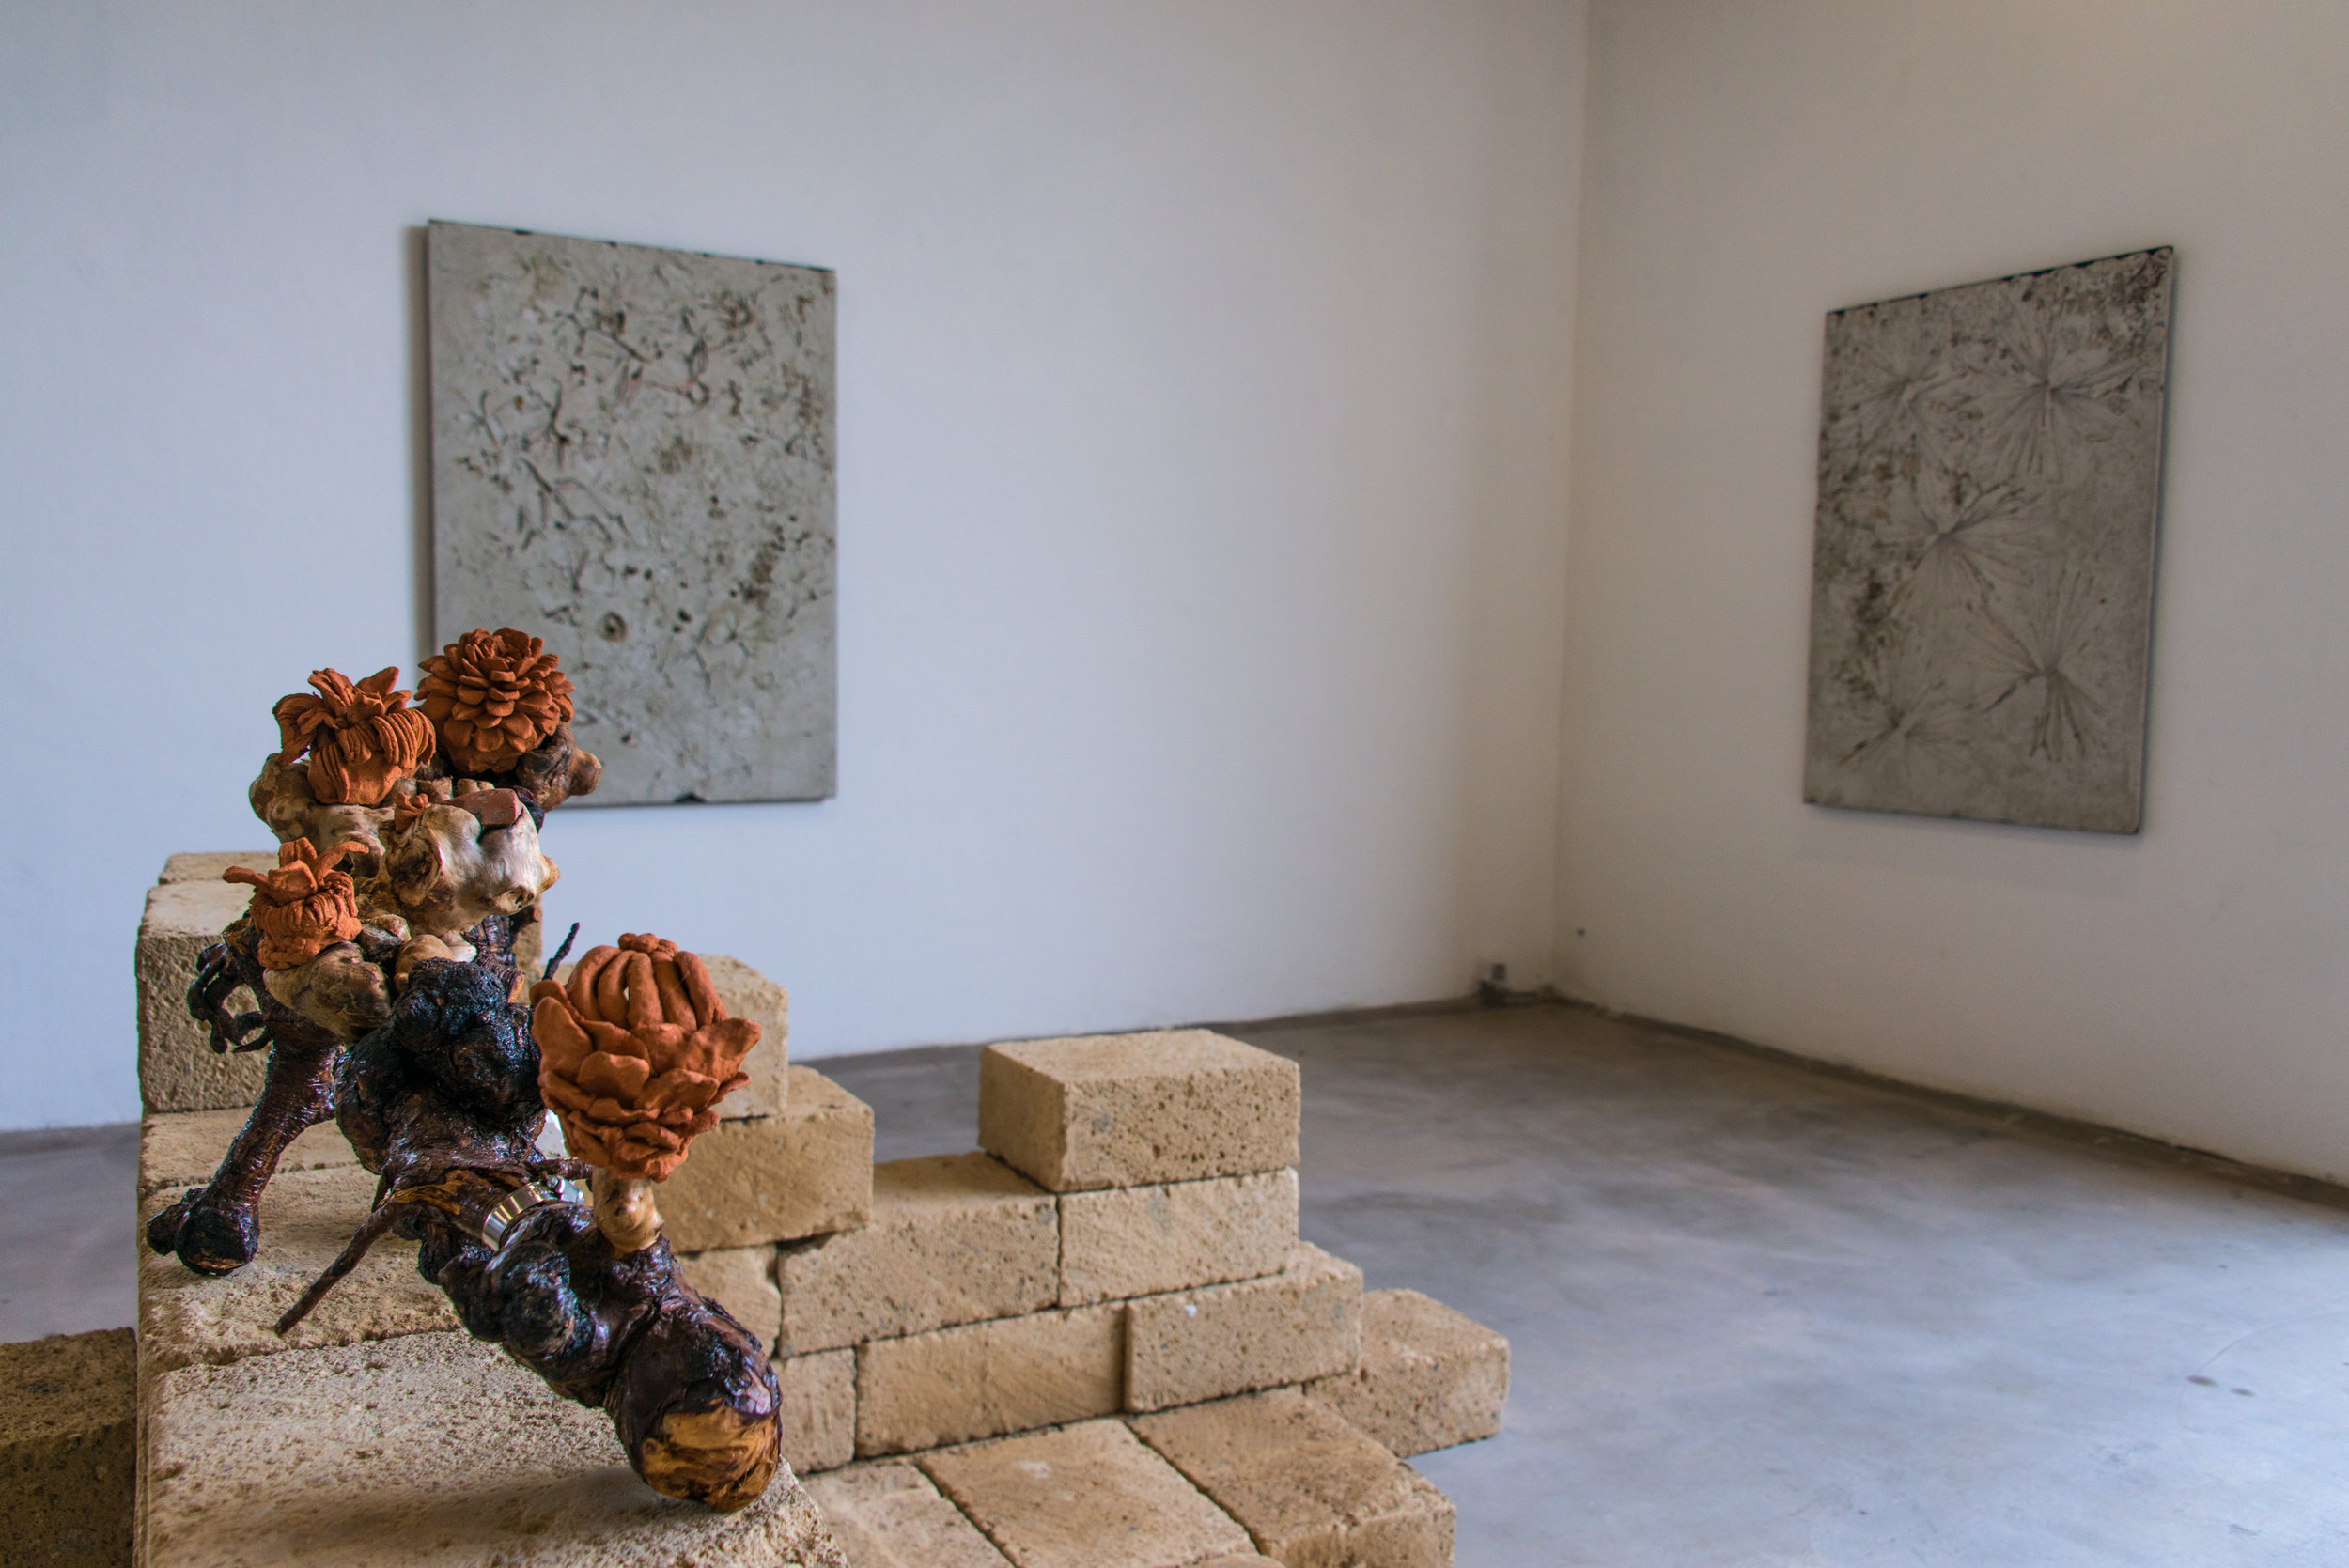 Installation view of  Nuova Terra Antica  at La Vallonea Works by Benedetto Pietromarchi and Alessandro Piangiamore